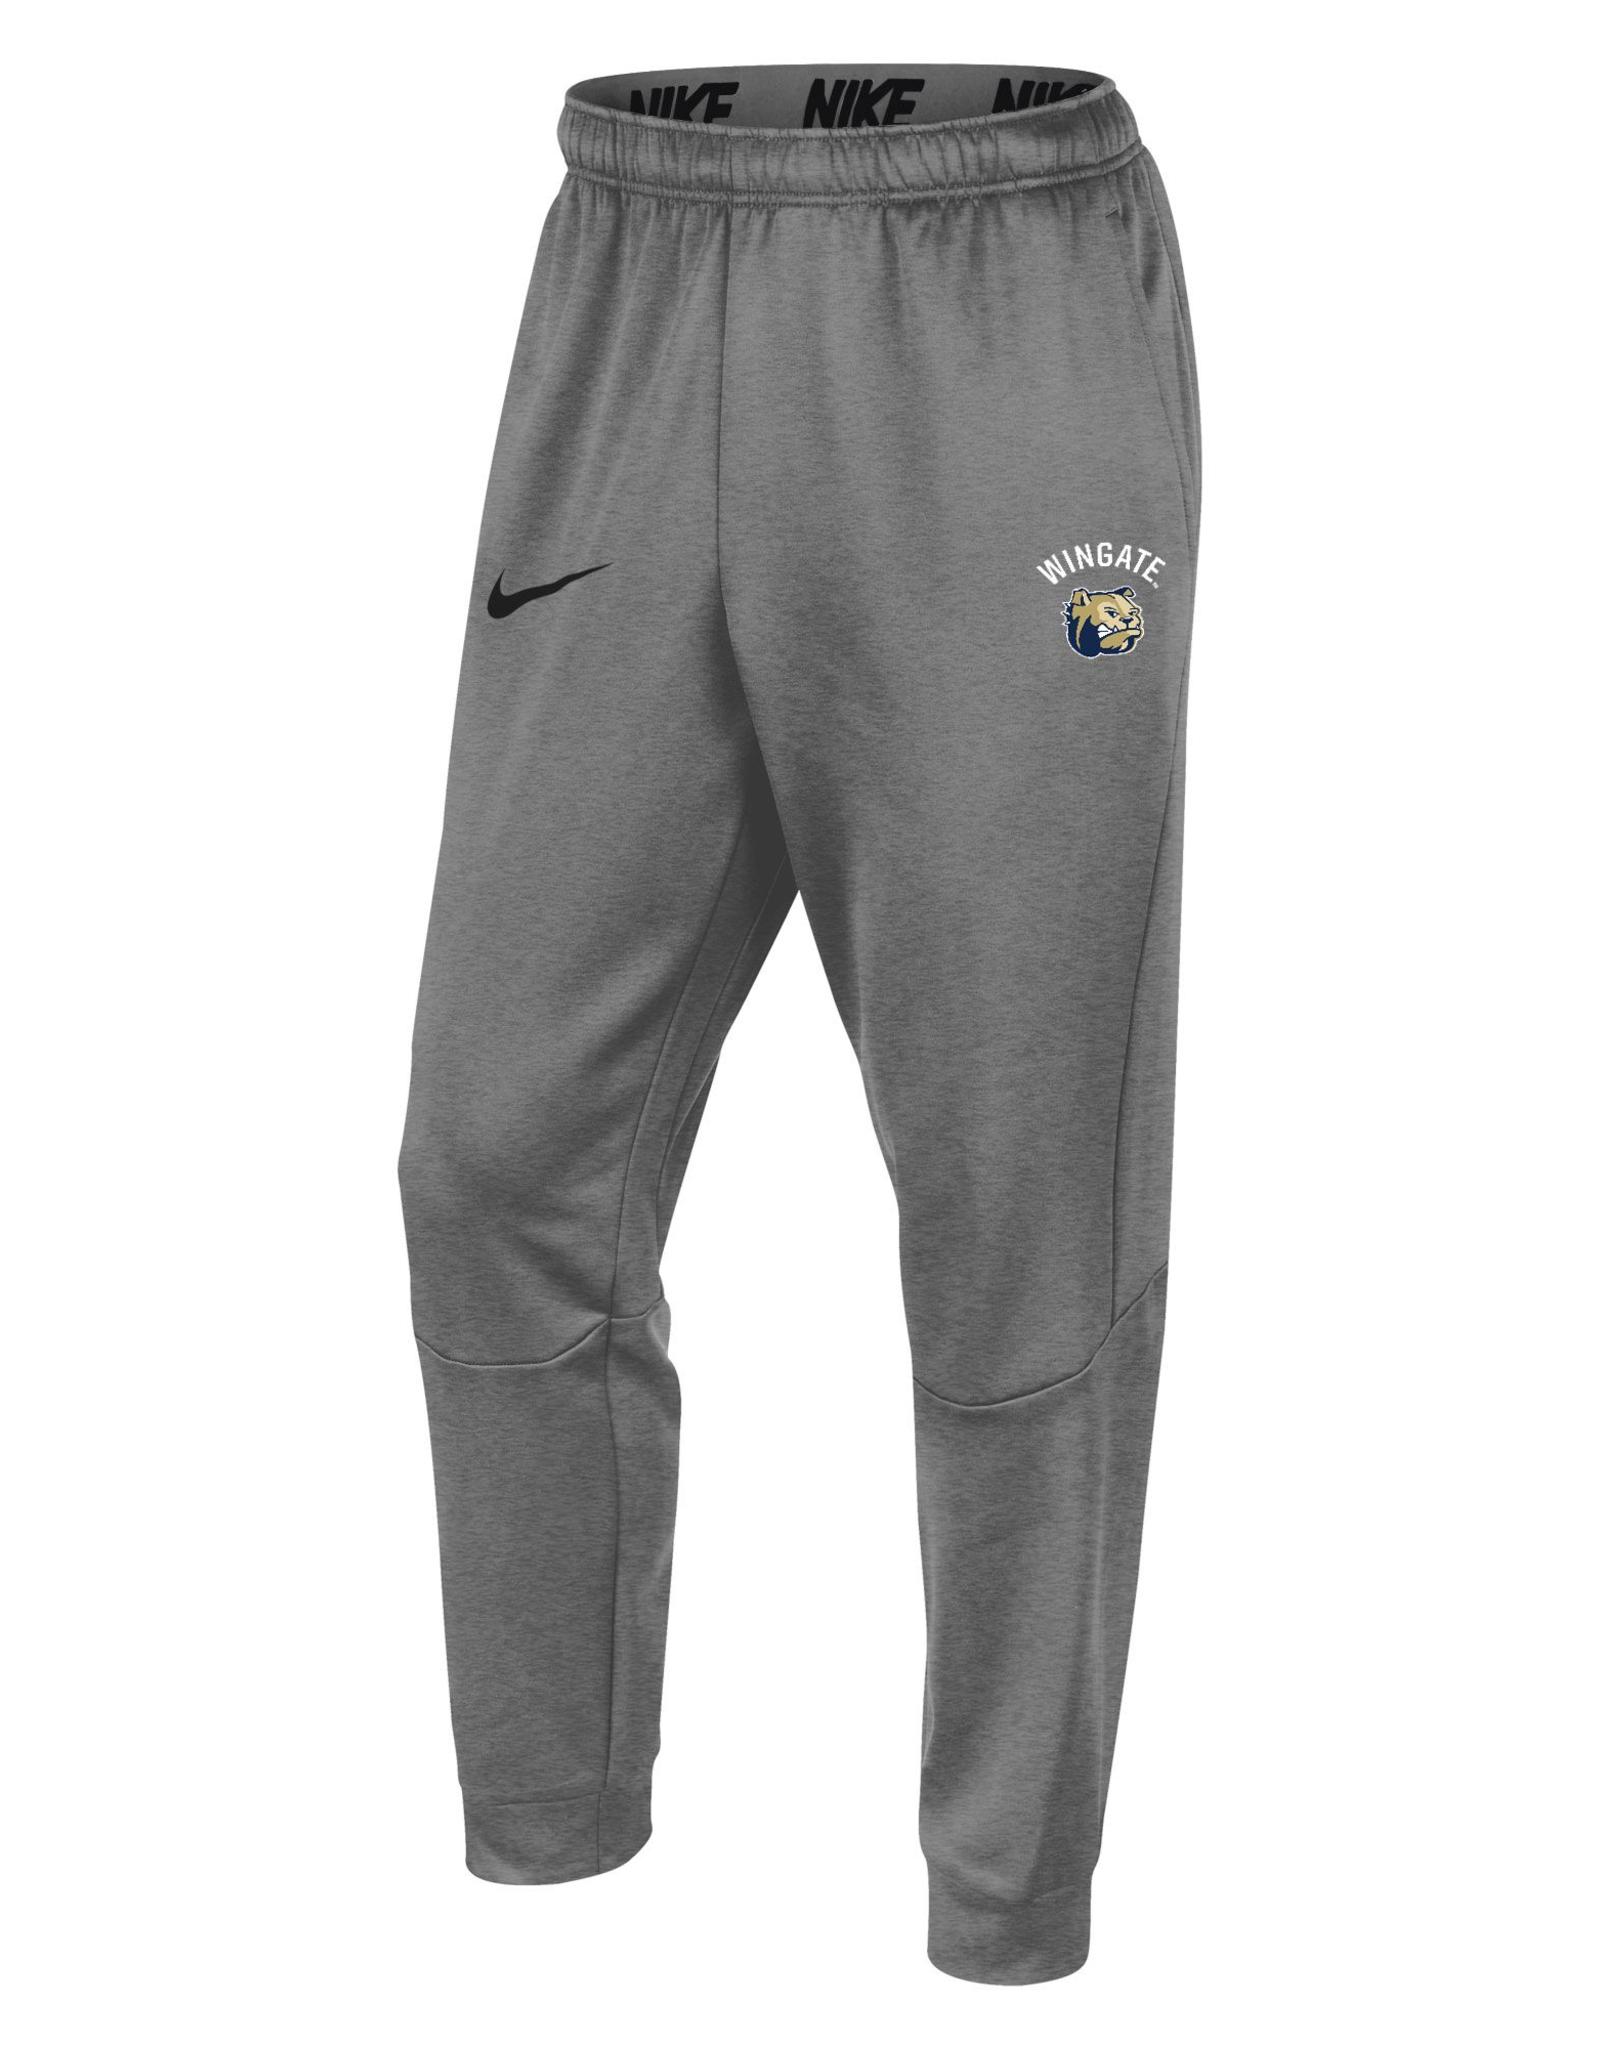 Nike Grey Therma Tapered Pants